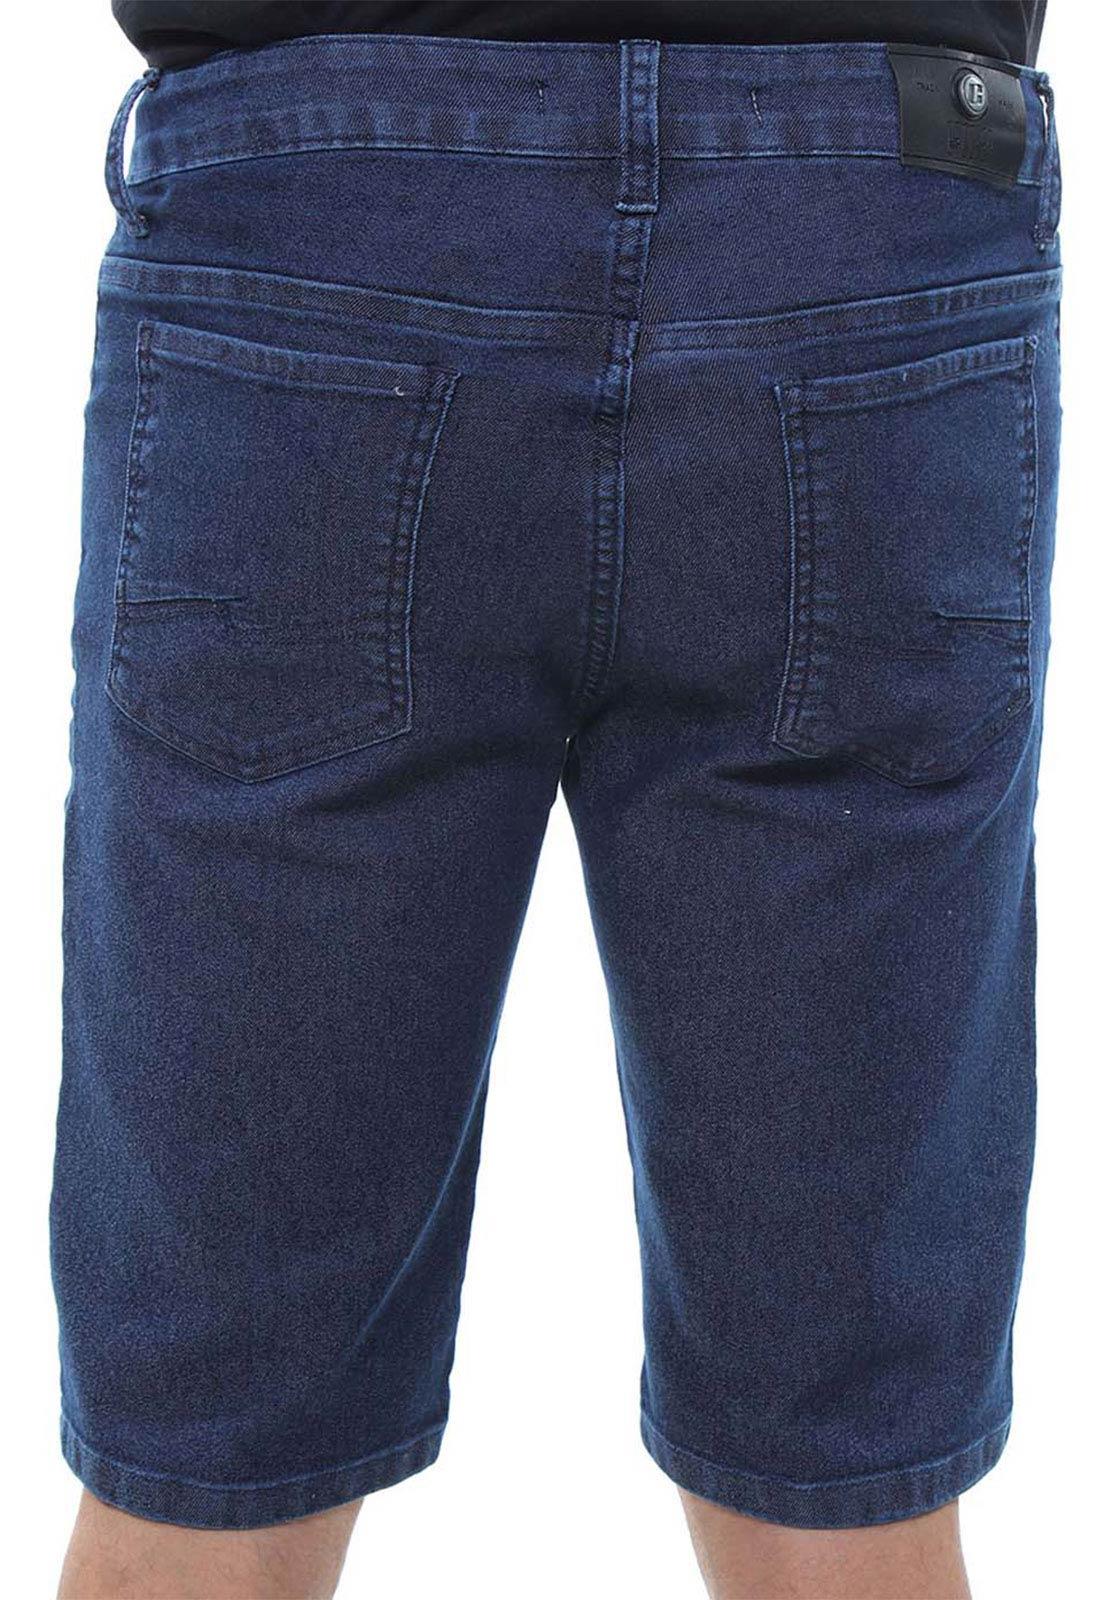 Bermuda Jeans Masculina Confort Crocker - 47839  - CROCKER JEANS